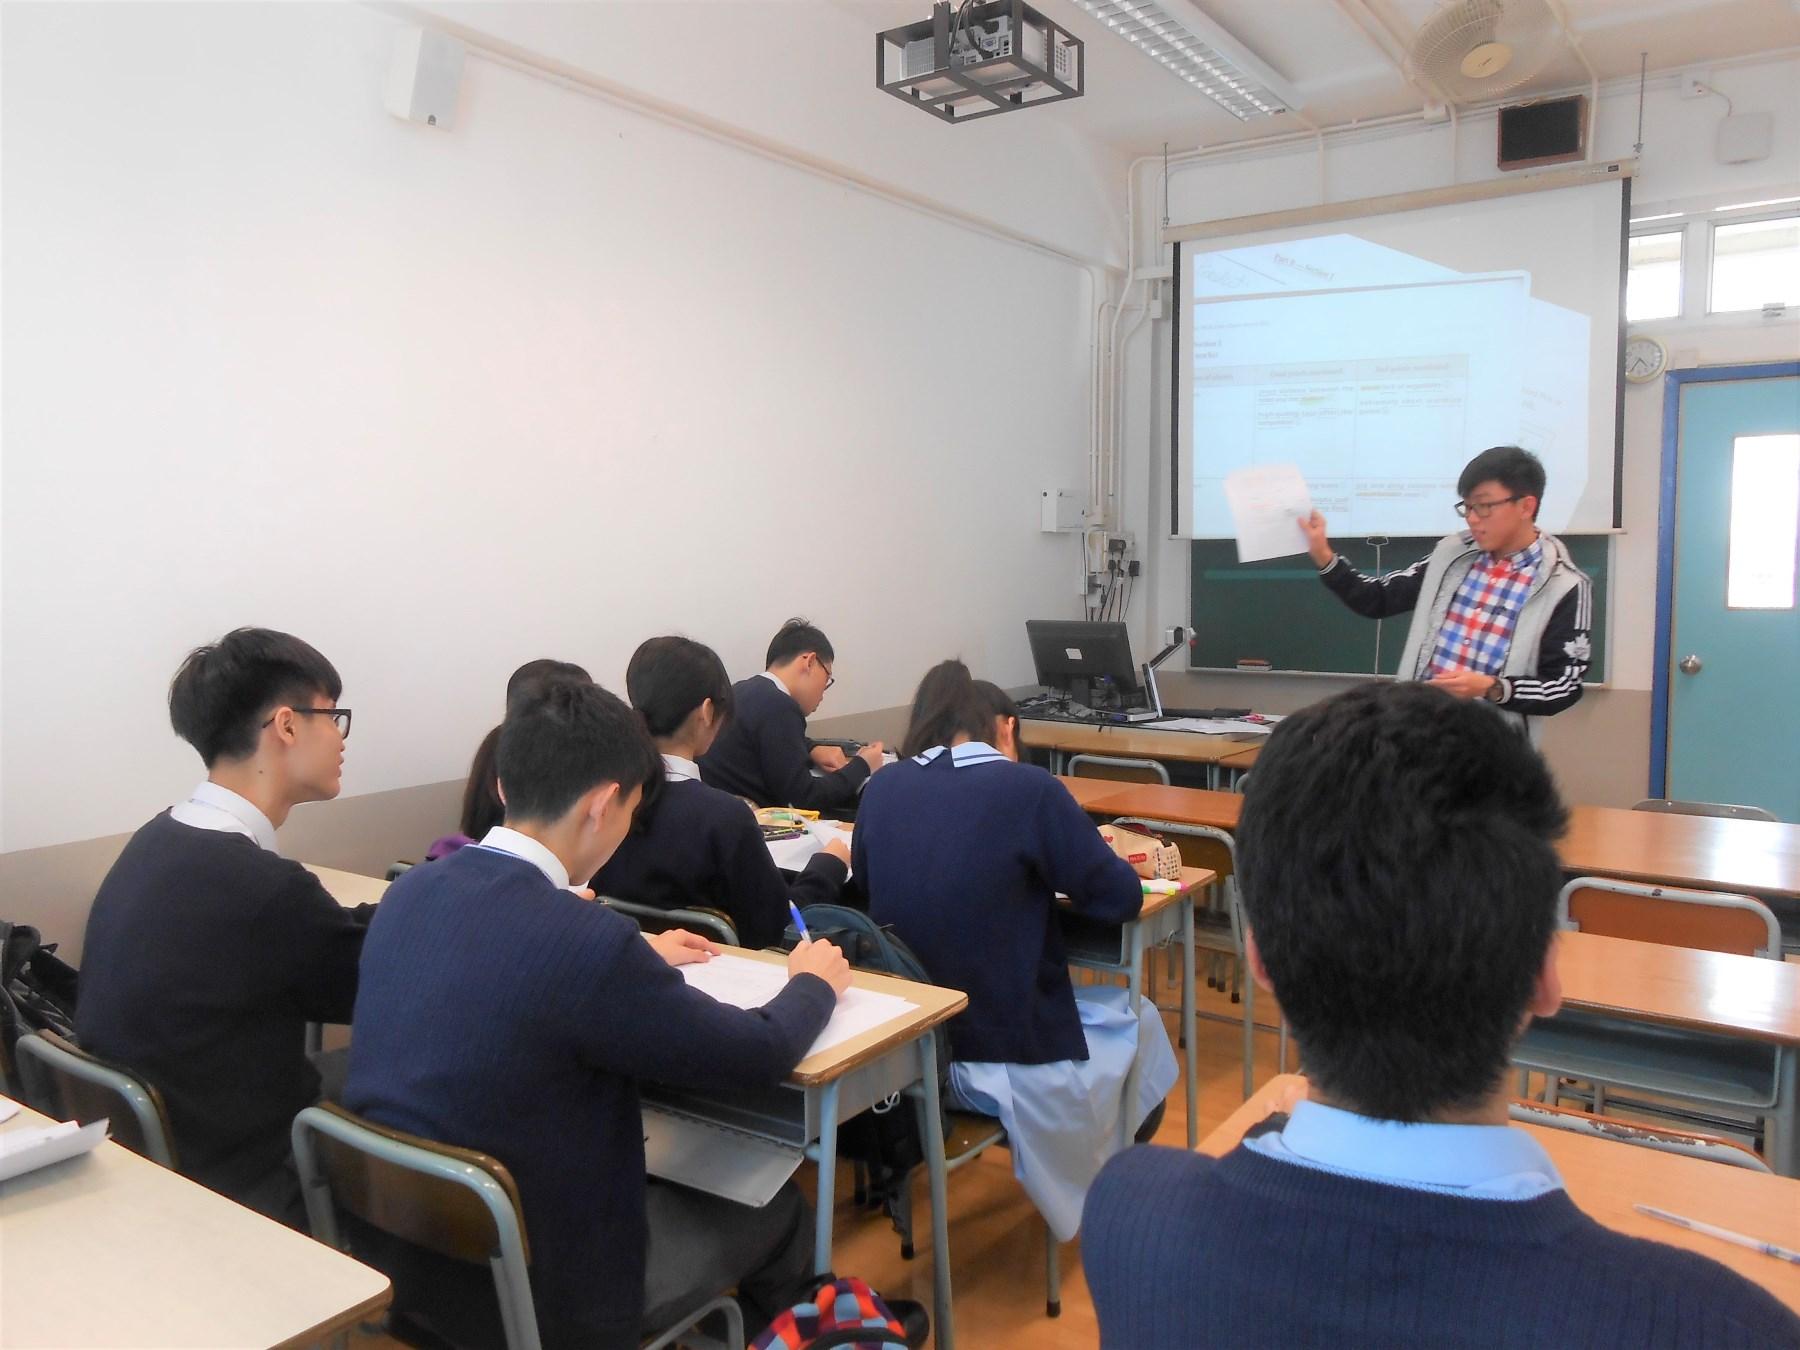 http://npc.edu.hk/sites/default/files/dscn9869.jpg